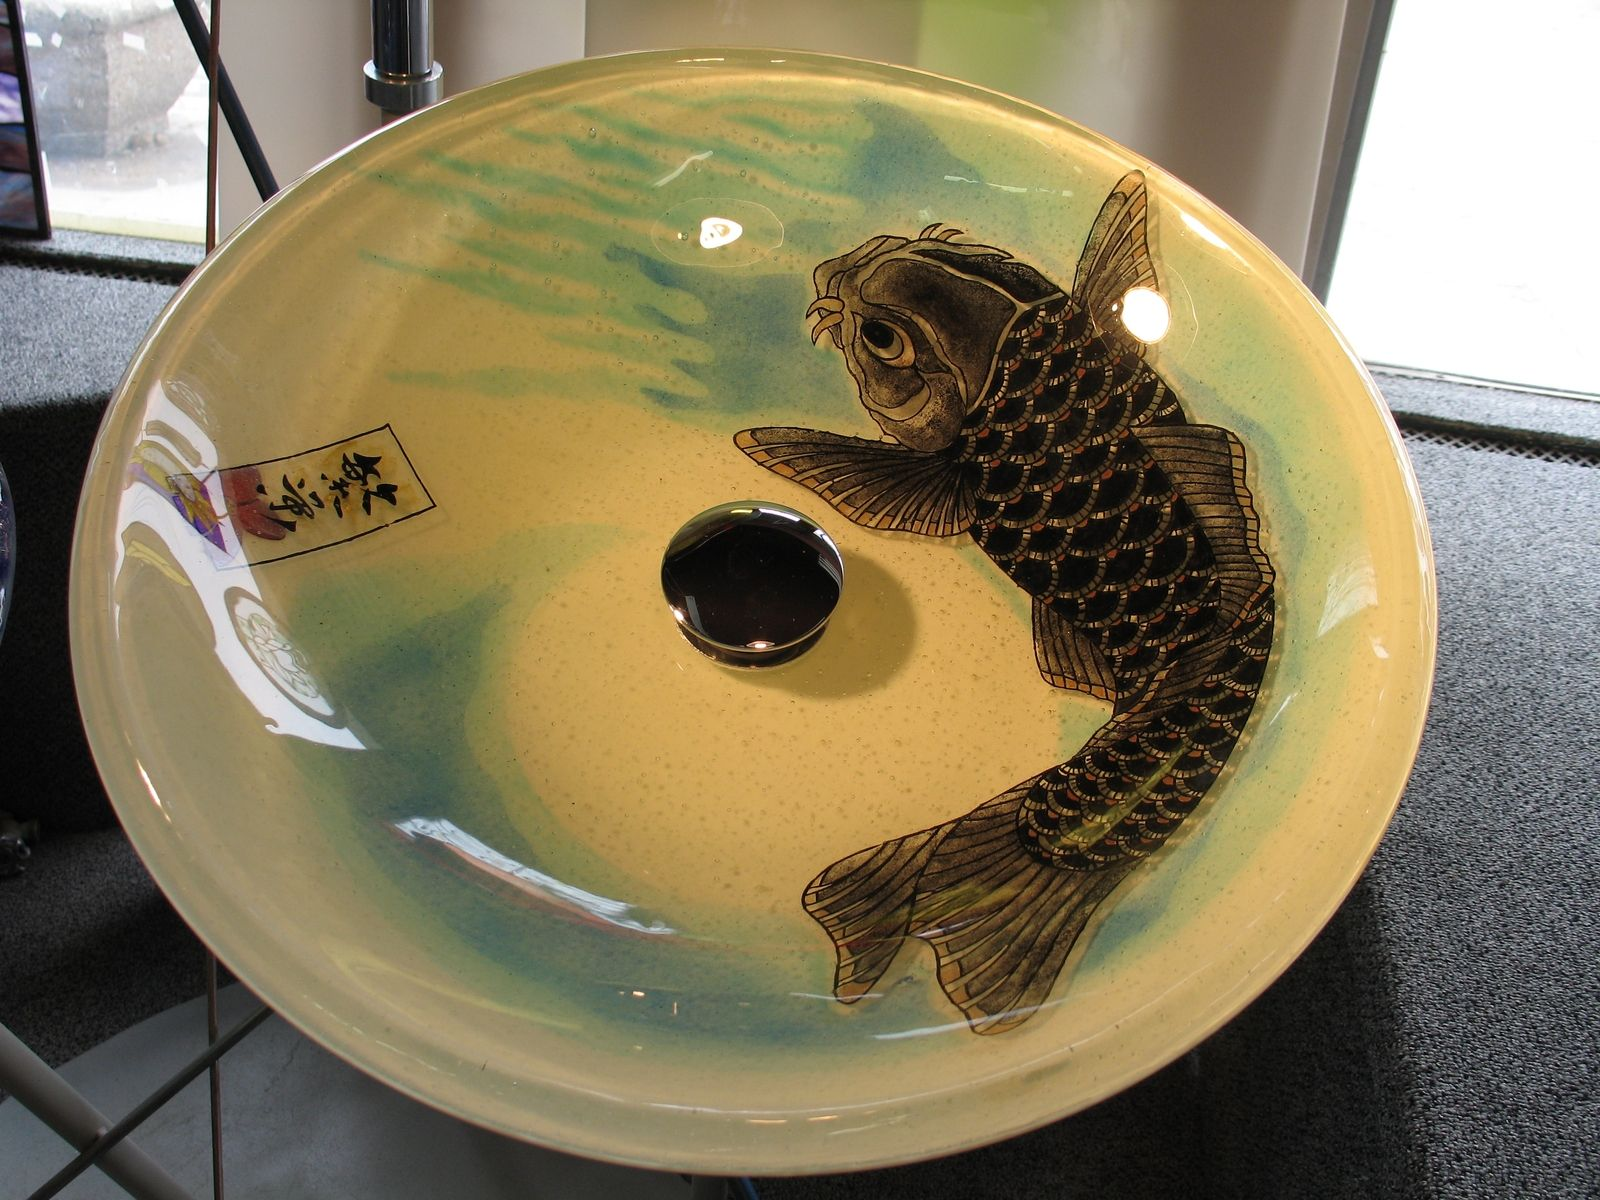 Hand Made Fused Glass Vessel Sink by Prairie Studio Glass  CustomMadecom